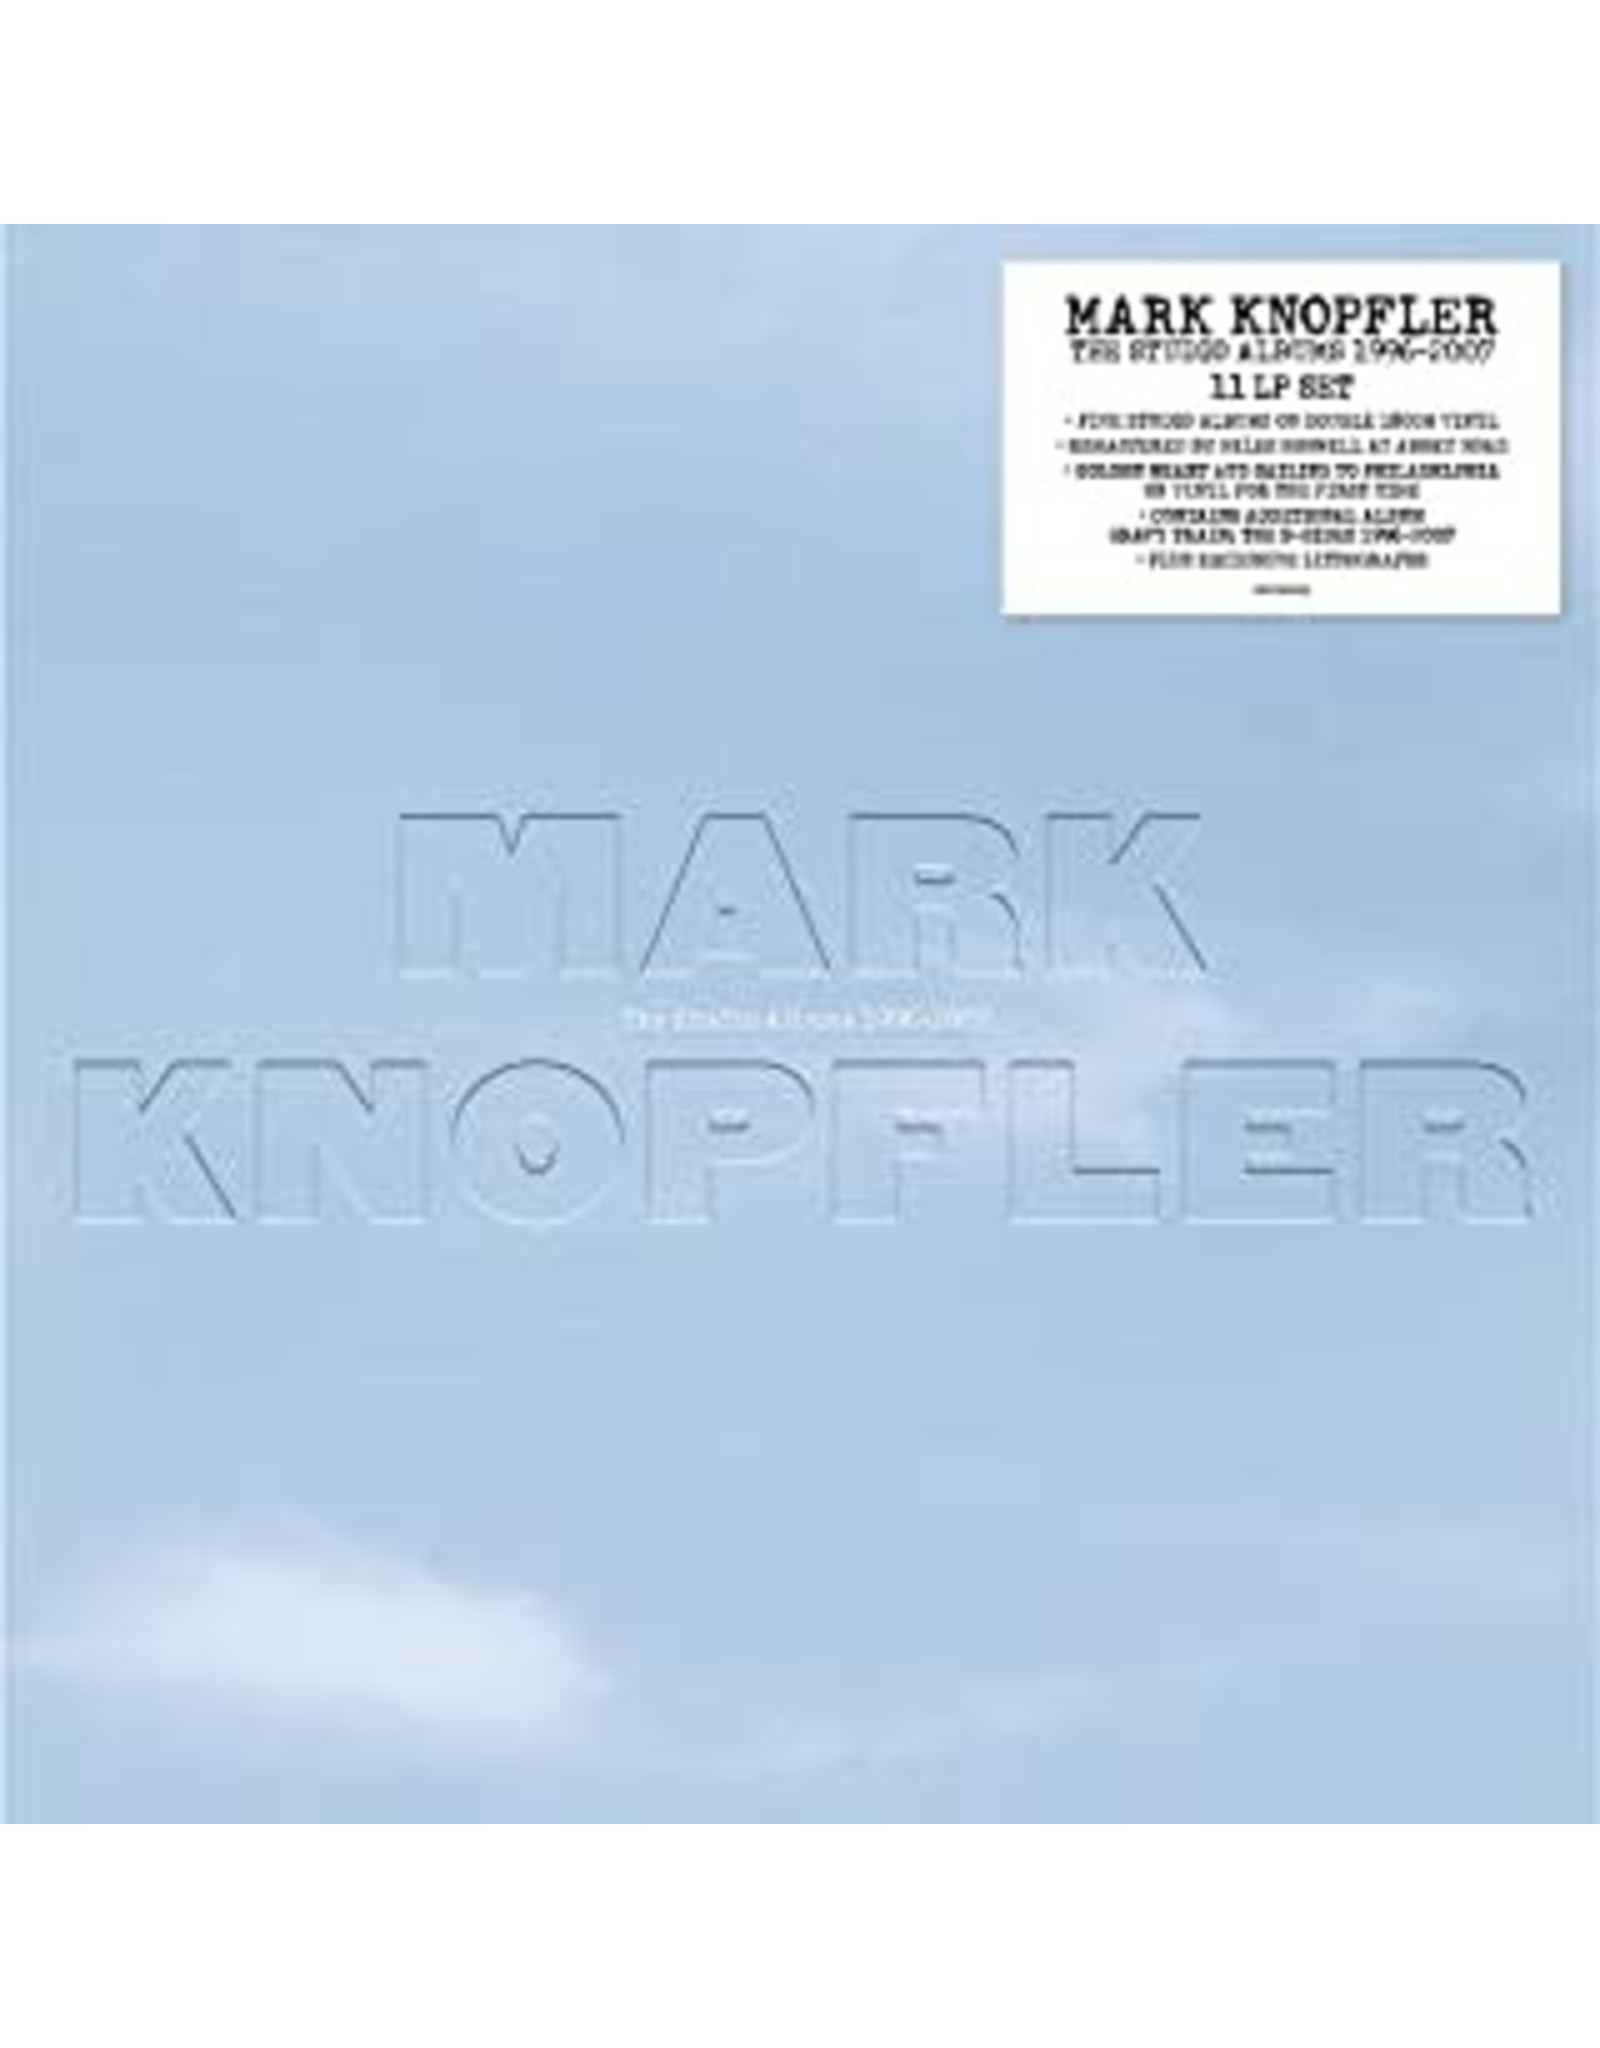 Knopfler, Mark - Studio Albums 1996-2007 11 LP SET LP